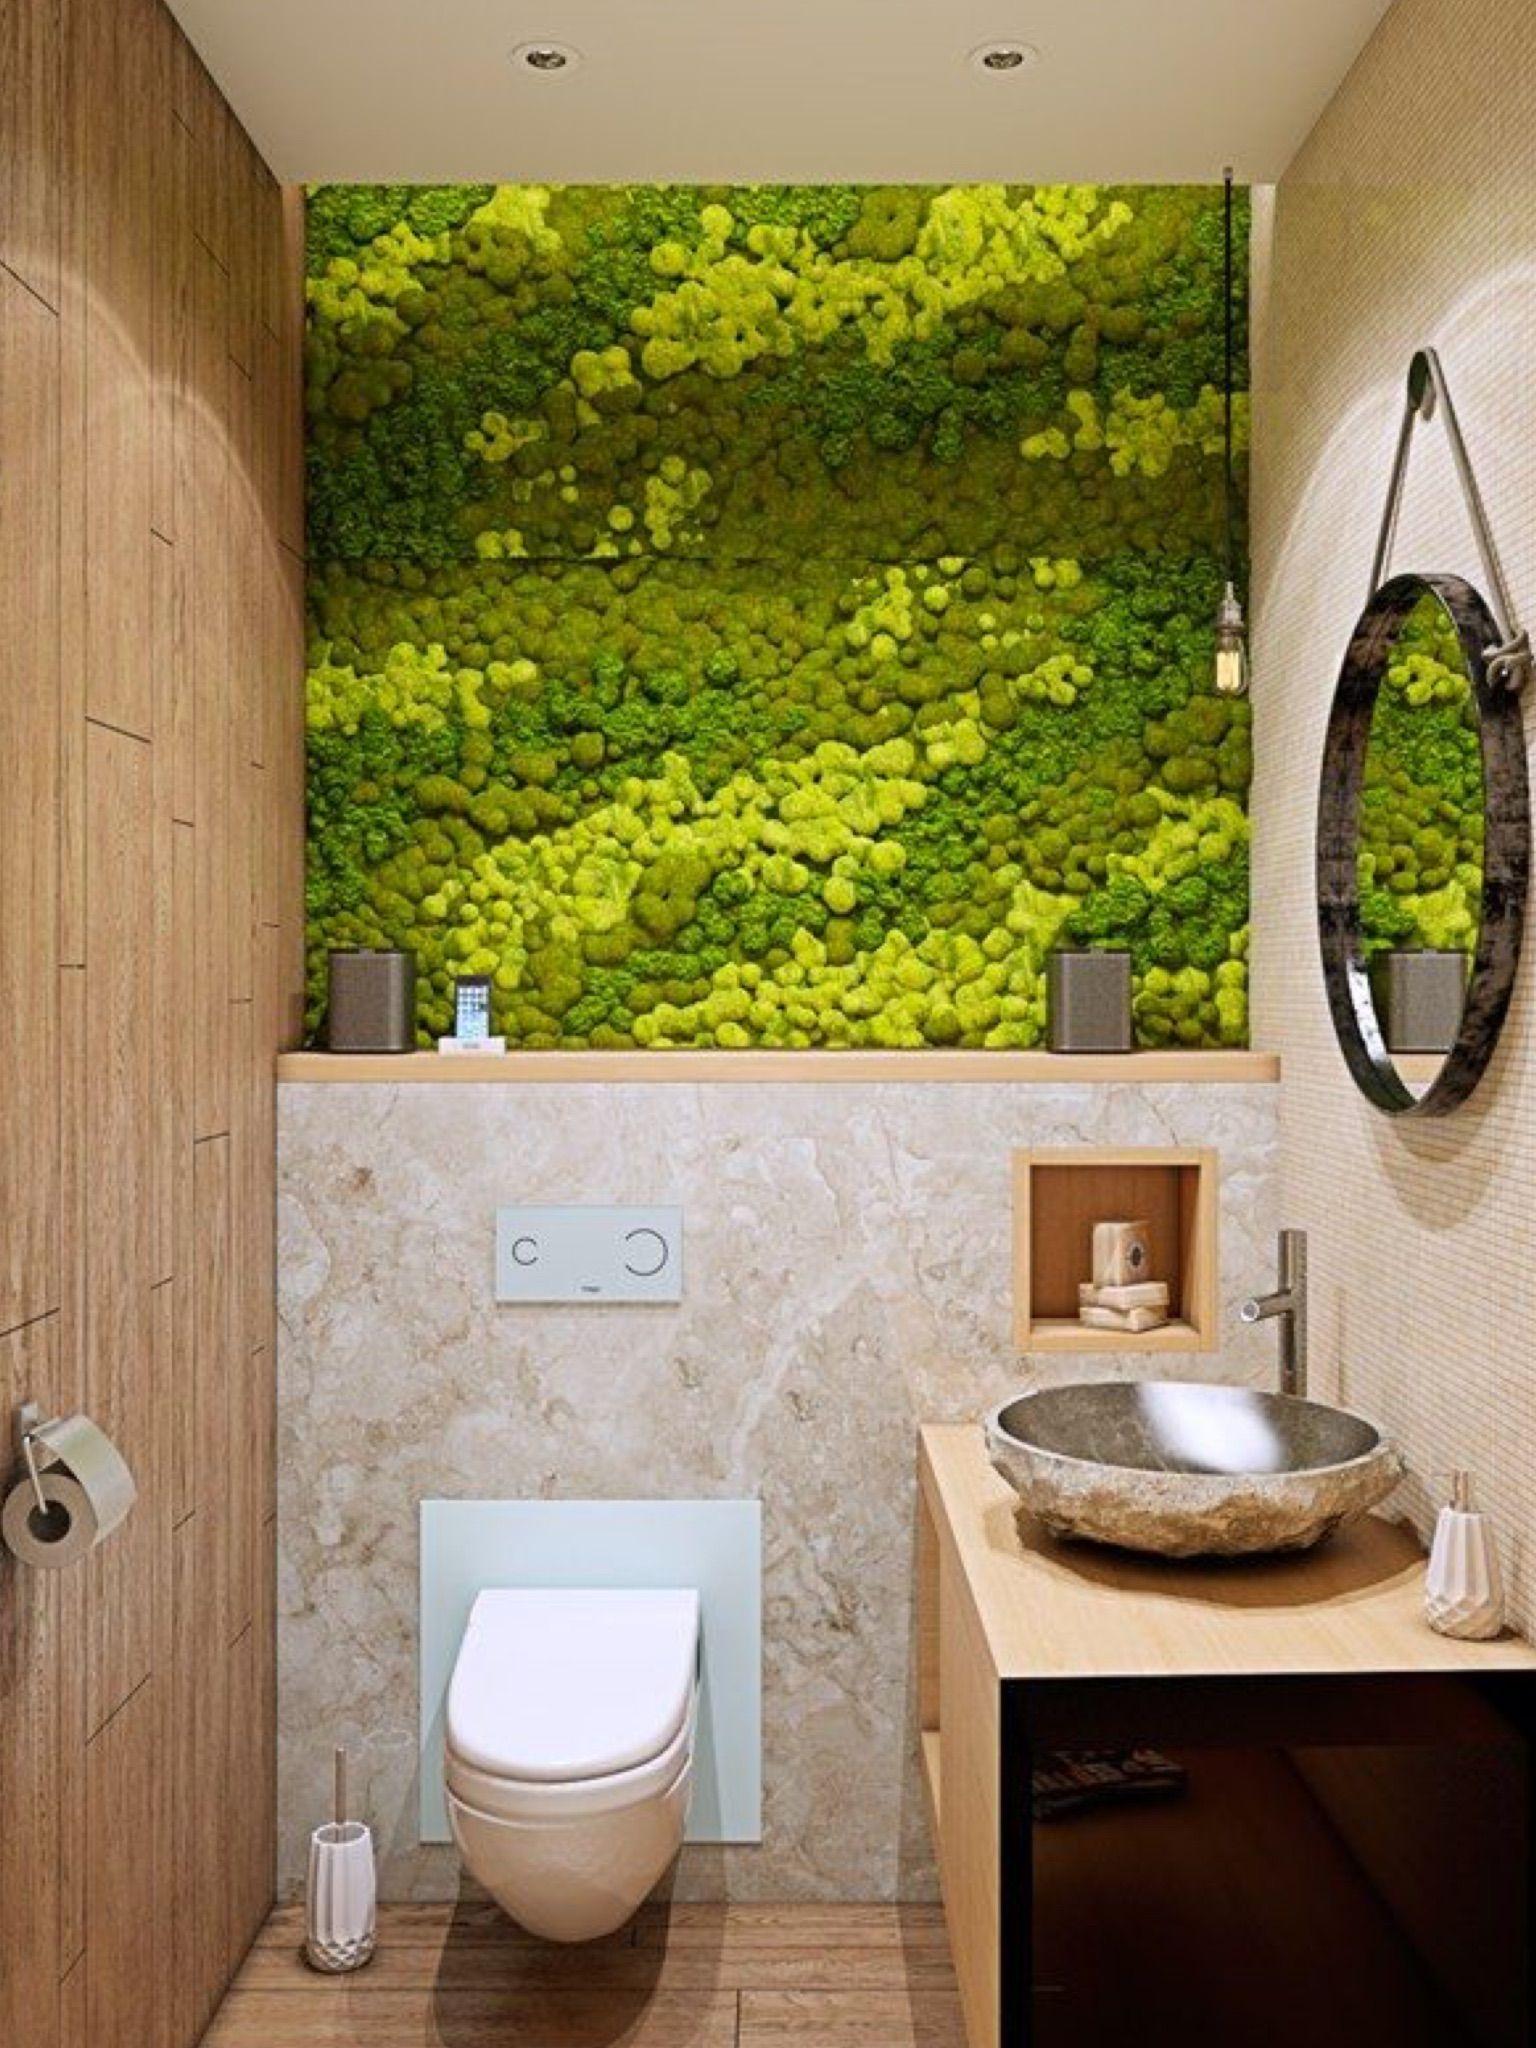 Pin By Masha Verhoogt On Green Wall Small Bathroom Remodel Designs Bathroom Remodel Designs Moss Wall Art